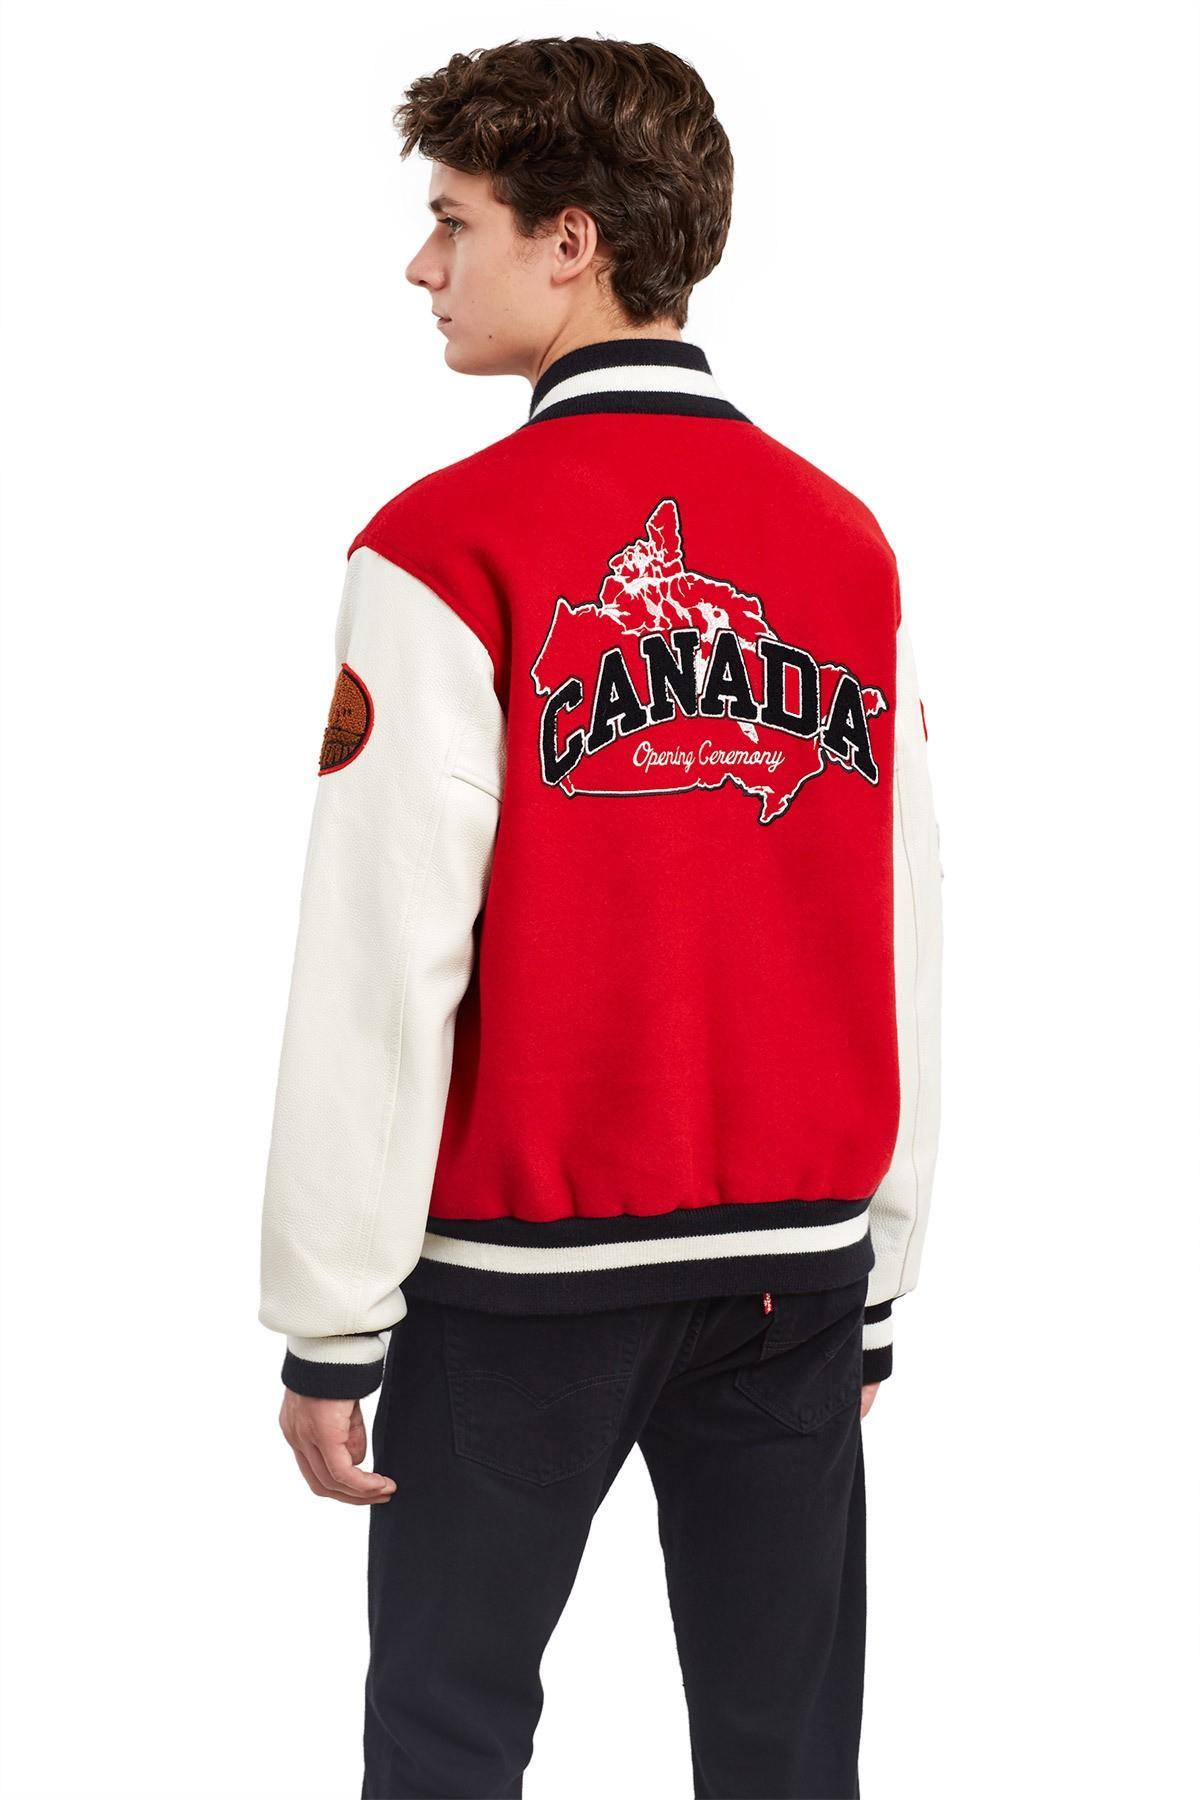 Opening Ceremony Canada Varsity Jacket In Red Multi